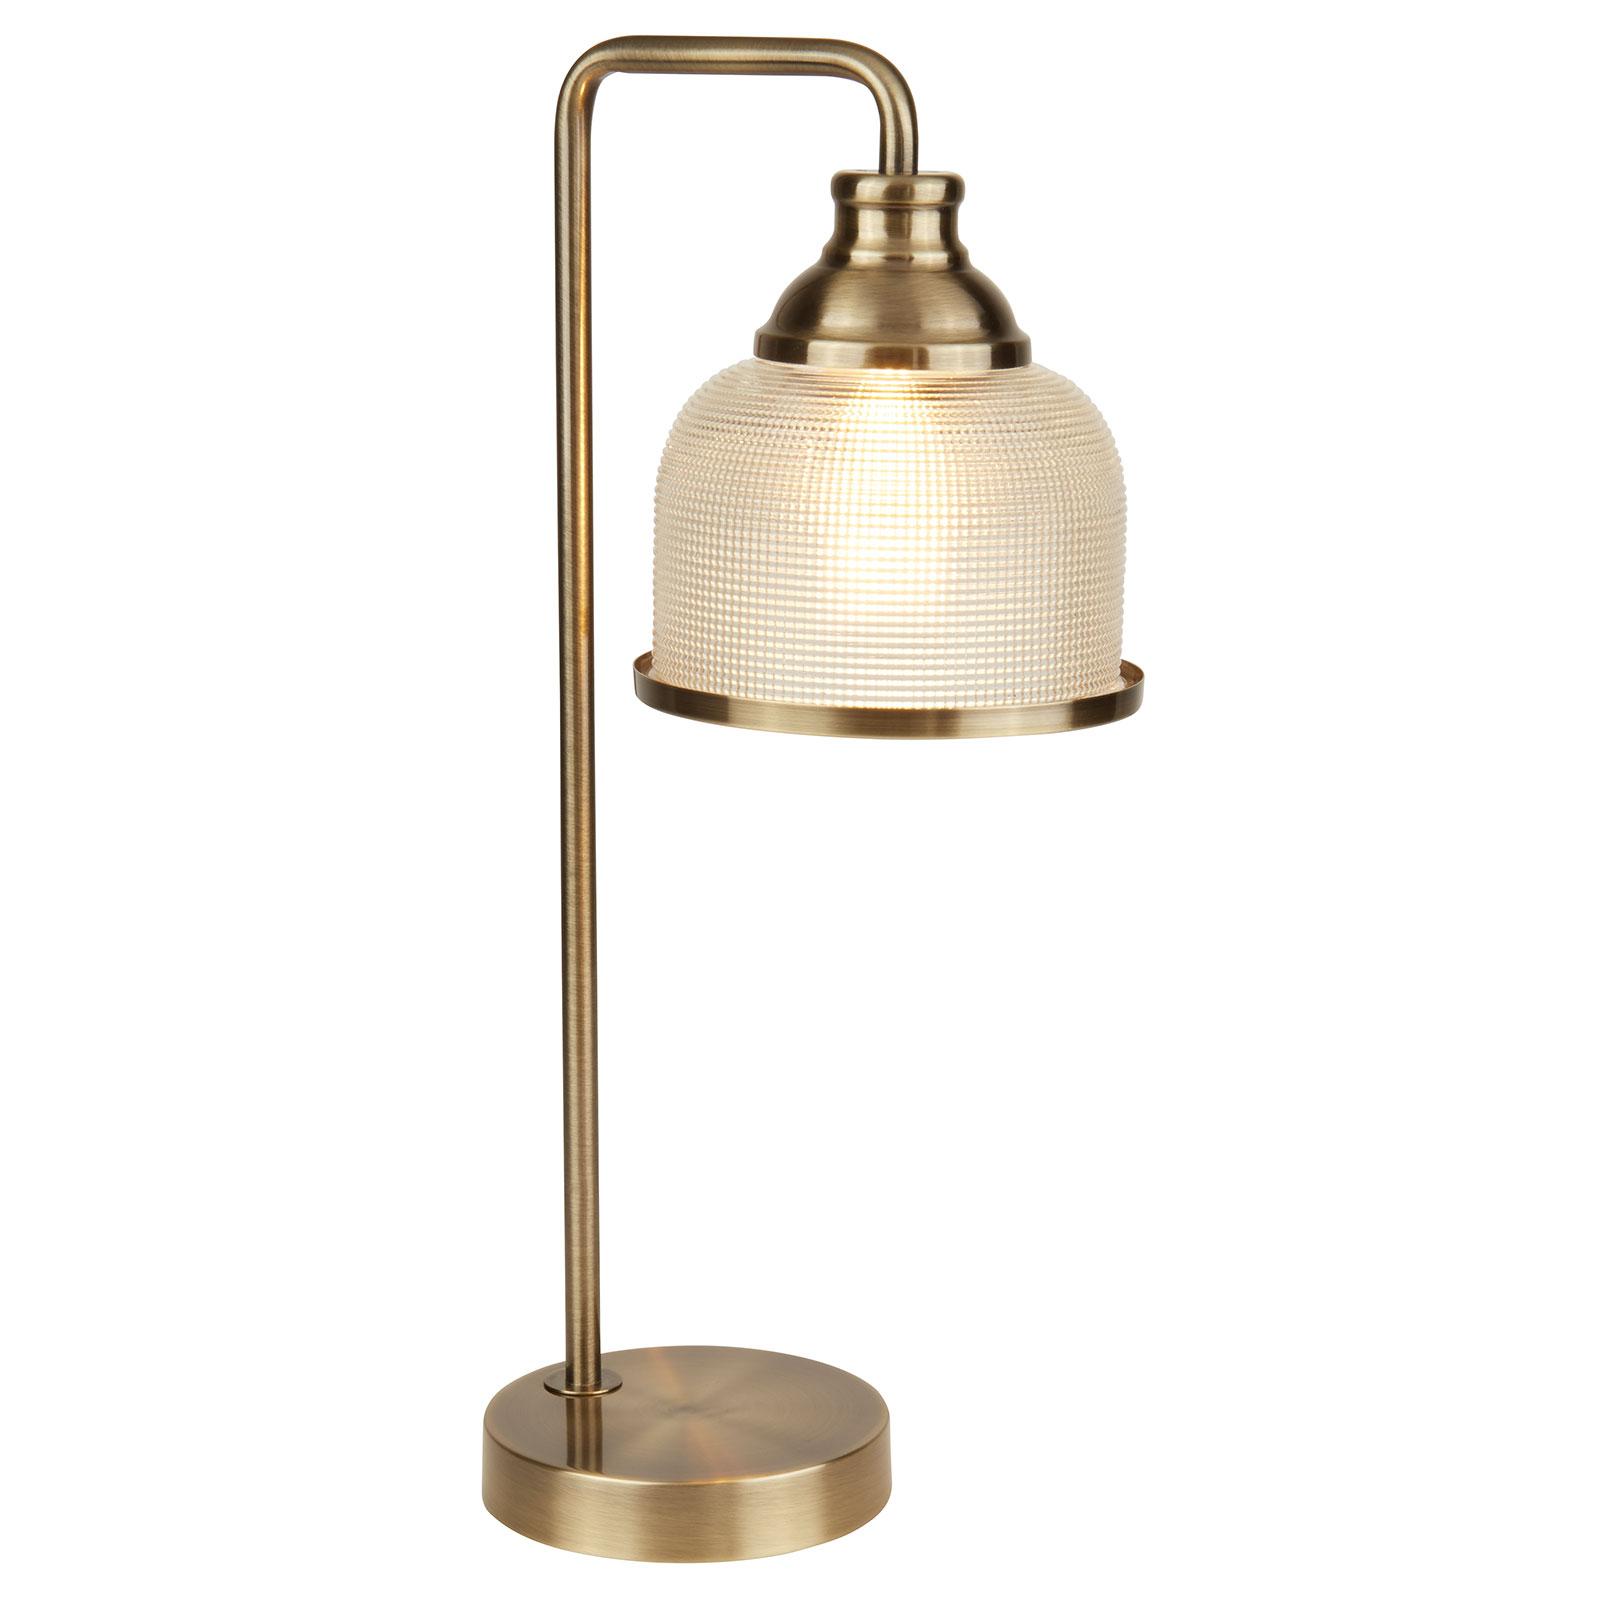 Bistro II pöytälamppu Holophane-lasia vanhamessink